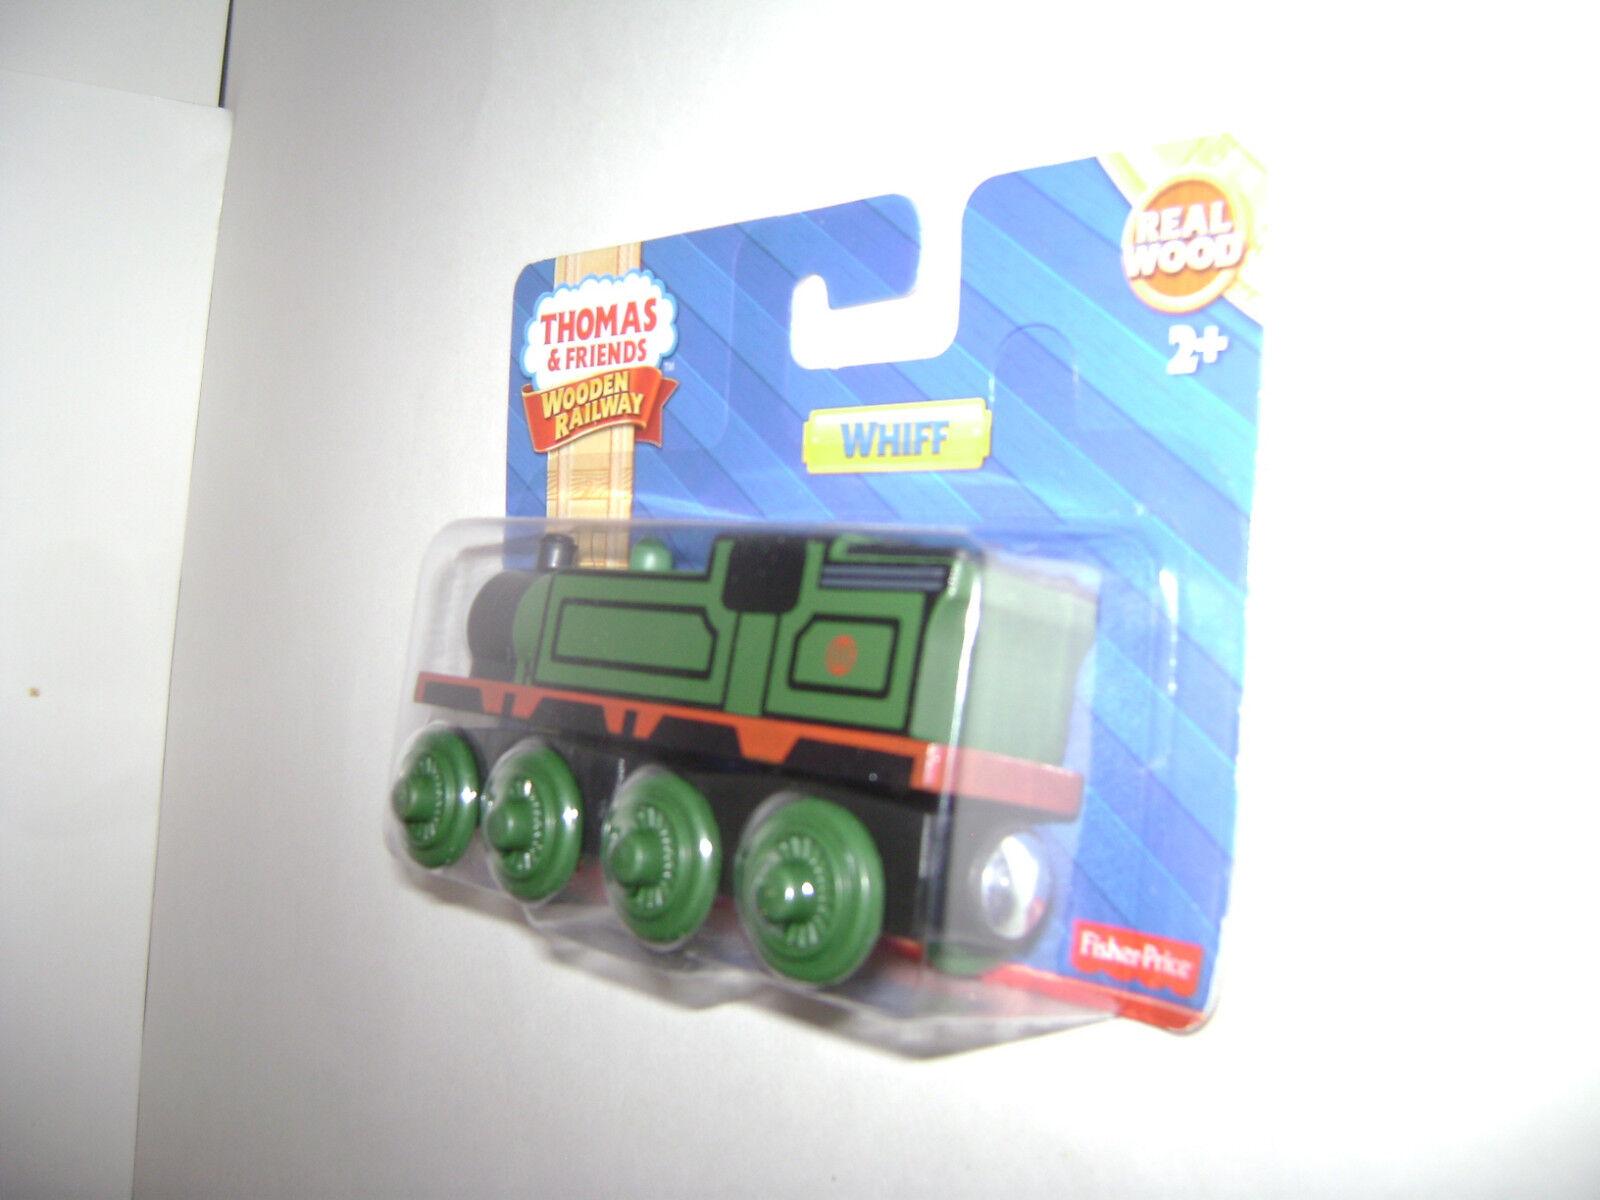 NIB Thomas & Friends Friends Friends the Train Wooden Railway WHIFF NEW Wood RETIRED b77589